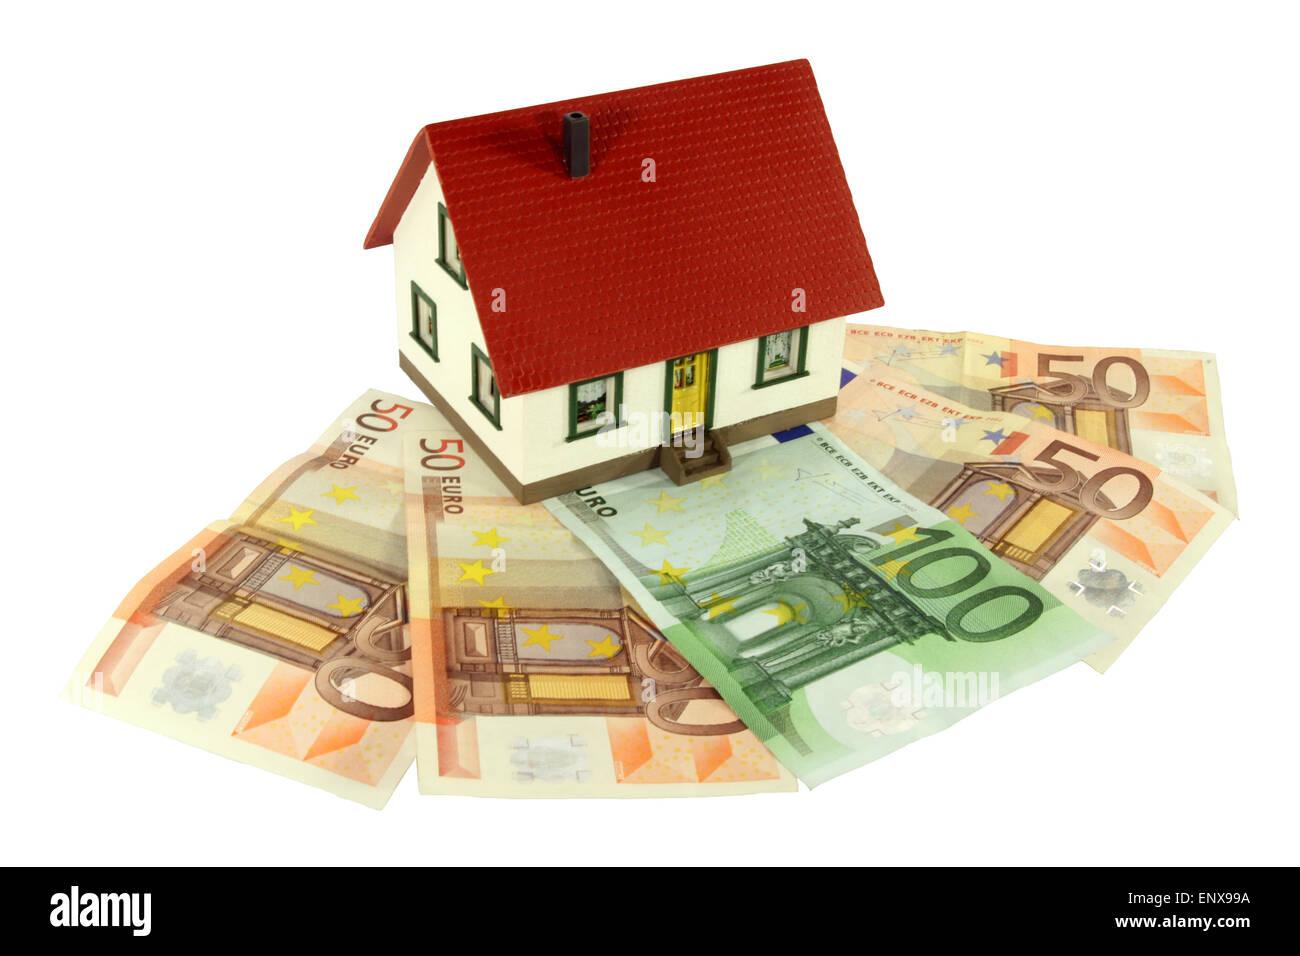 Immobilien als Geldanlage Stock Photo